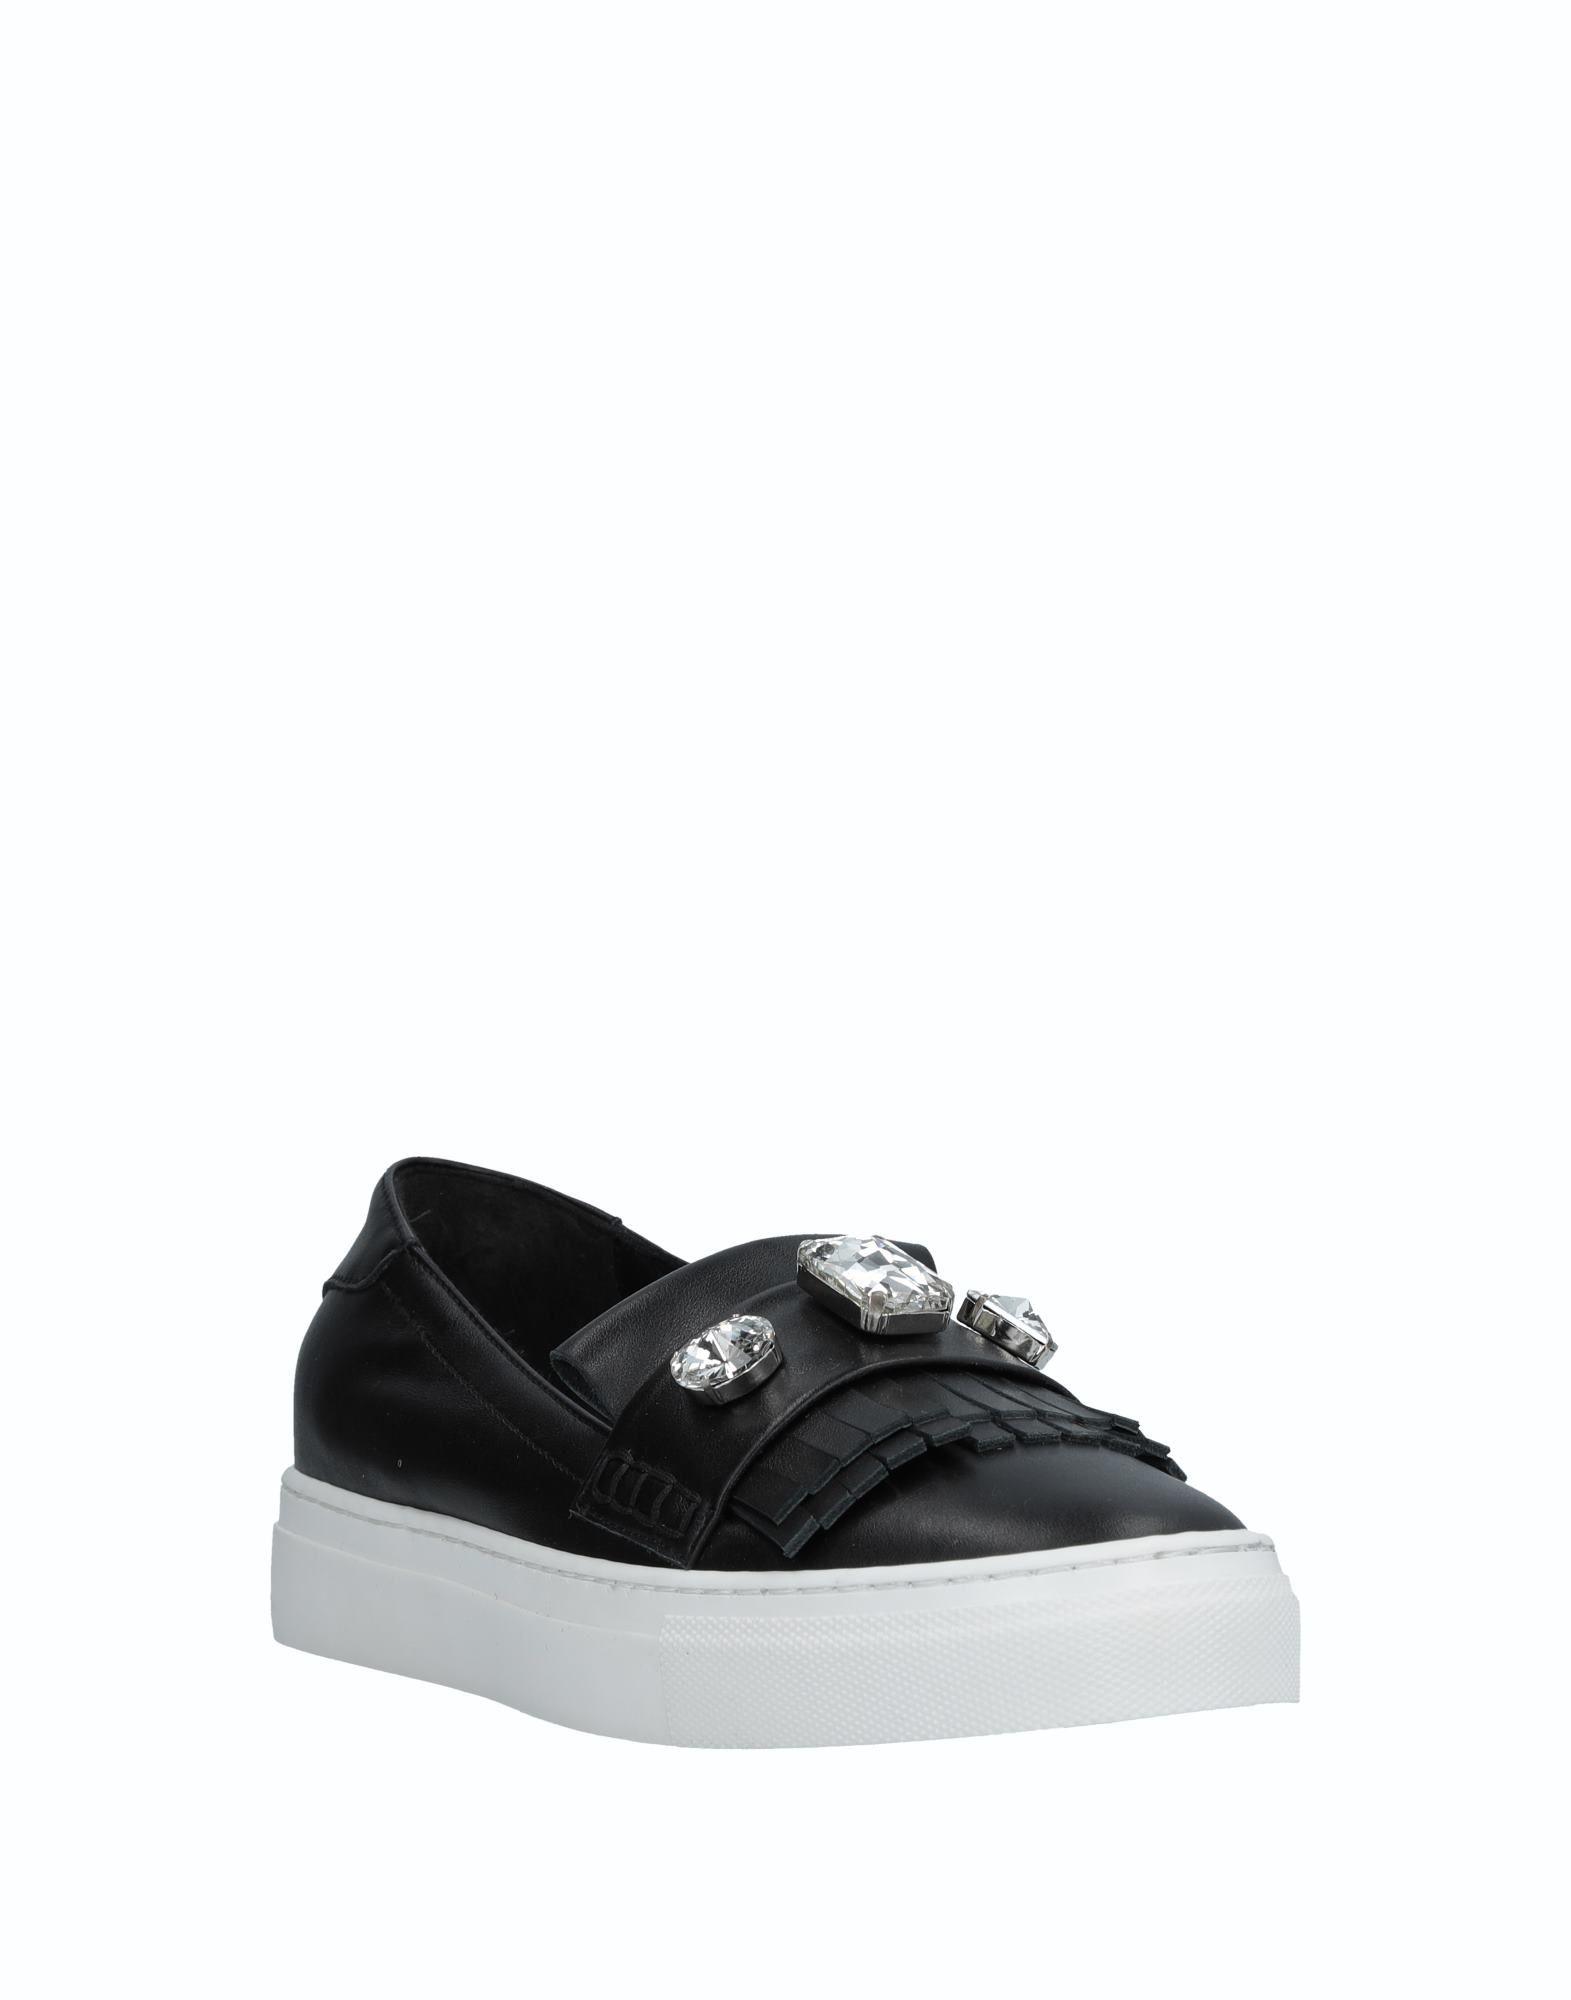 Liu •Jo Shoes Gute Sneakers Damen  11519612BX Gute Shoes Qualität beliebte Schuhe 5f1cc7